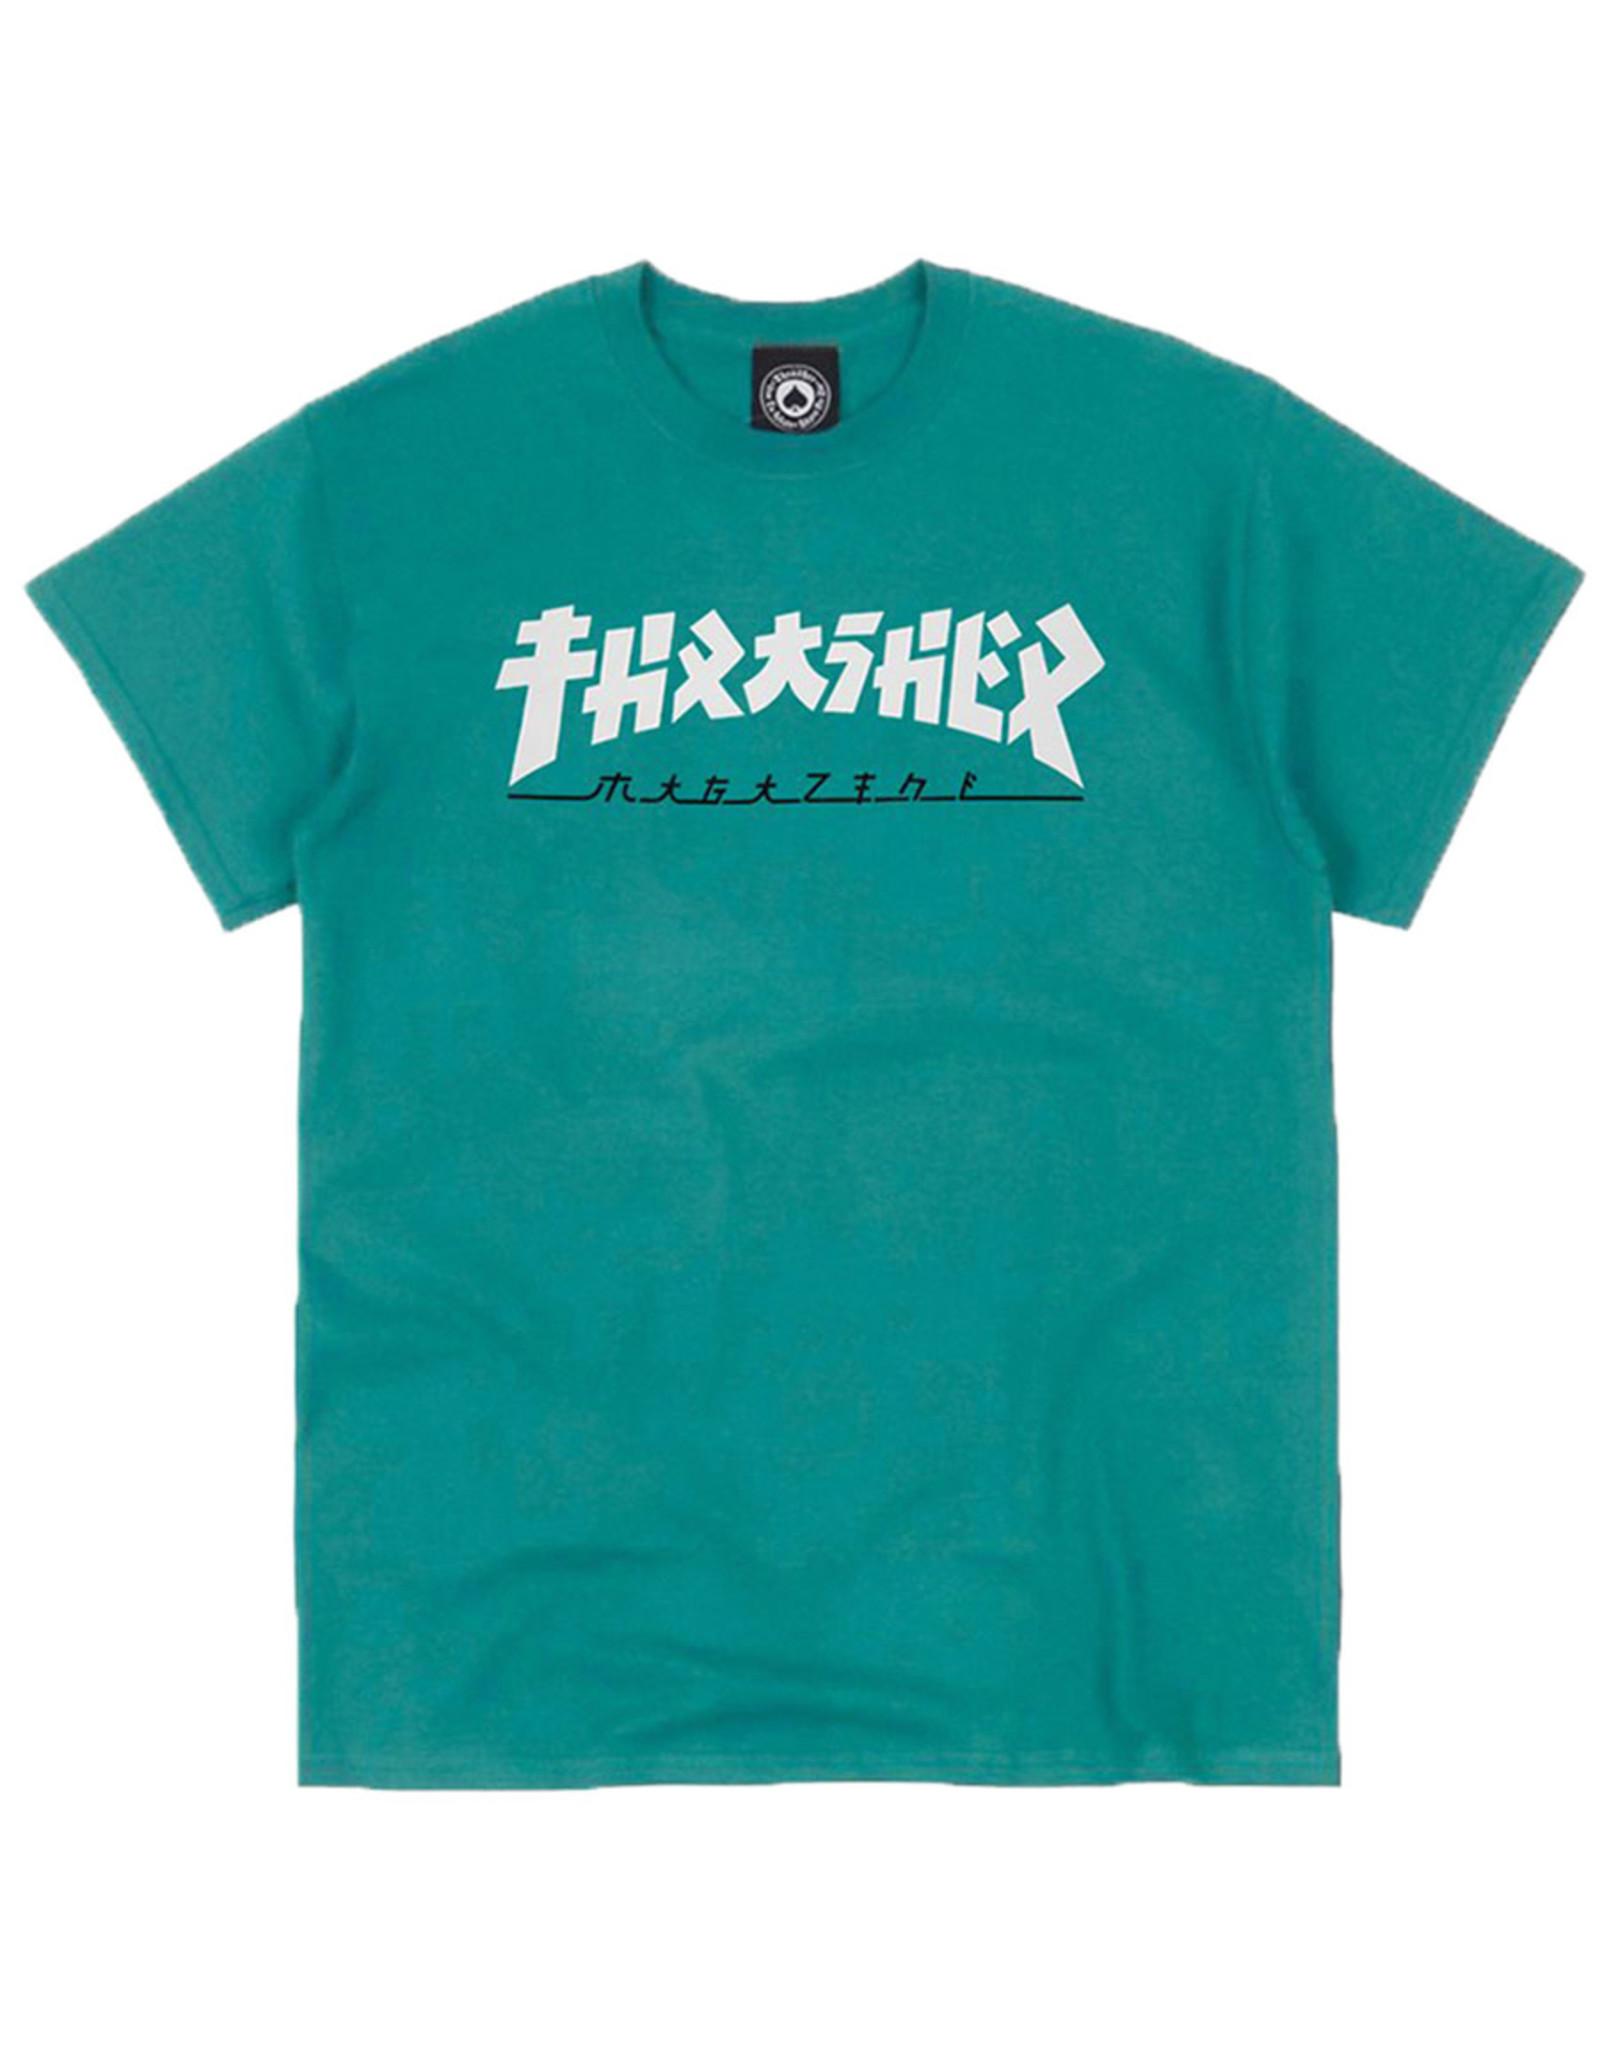 Thrasher Thrasher Tee Mens Godzilla S/S (Jade)